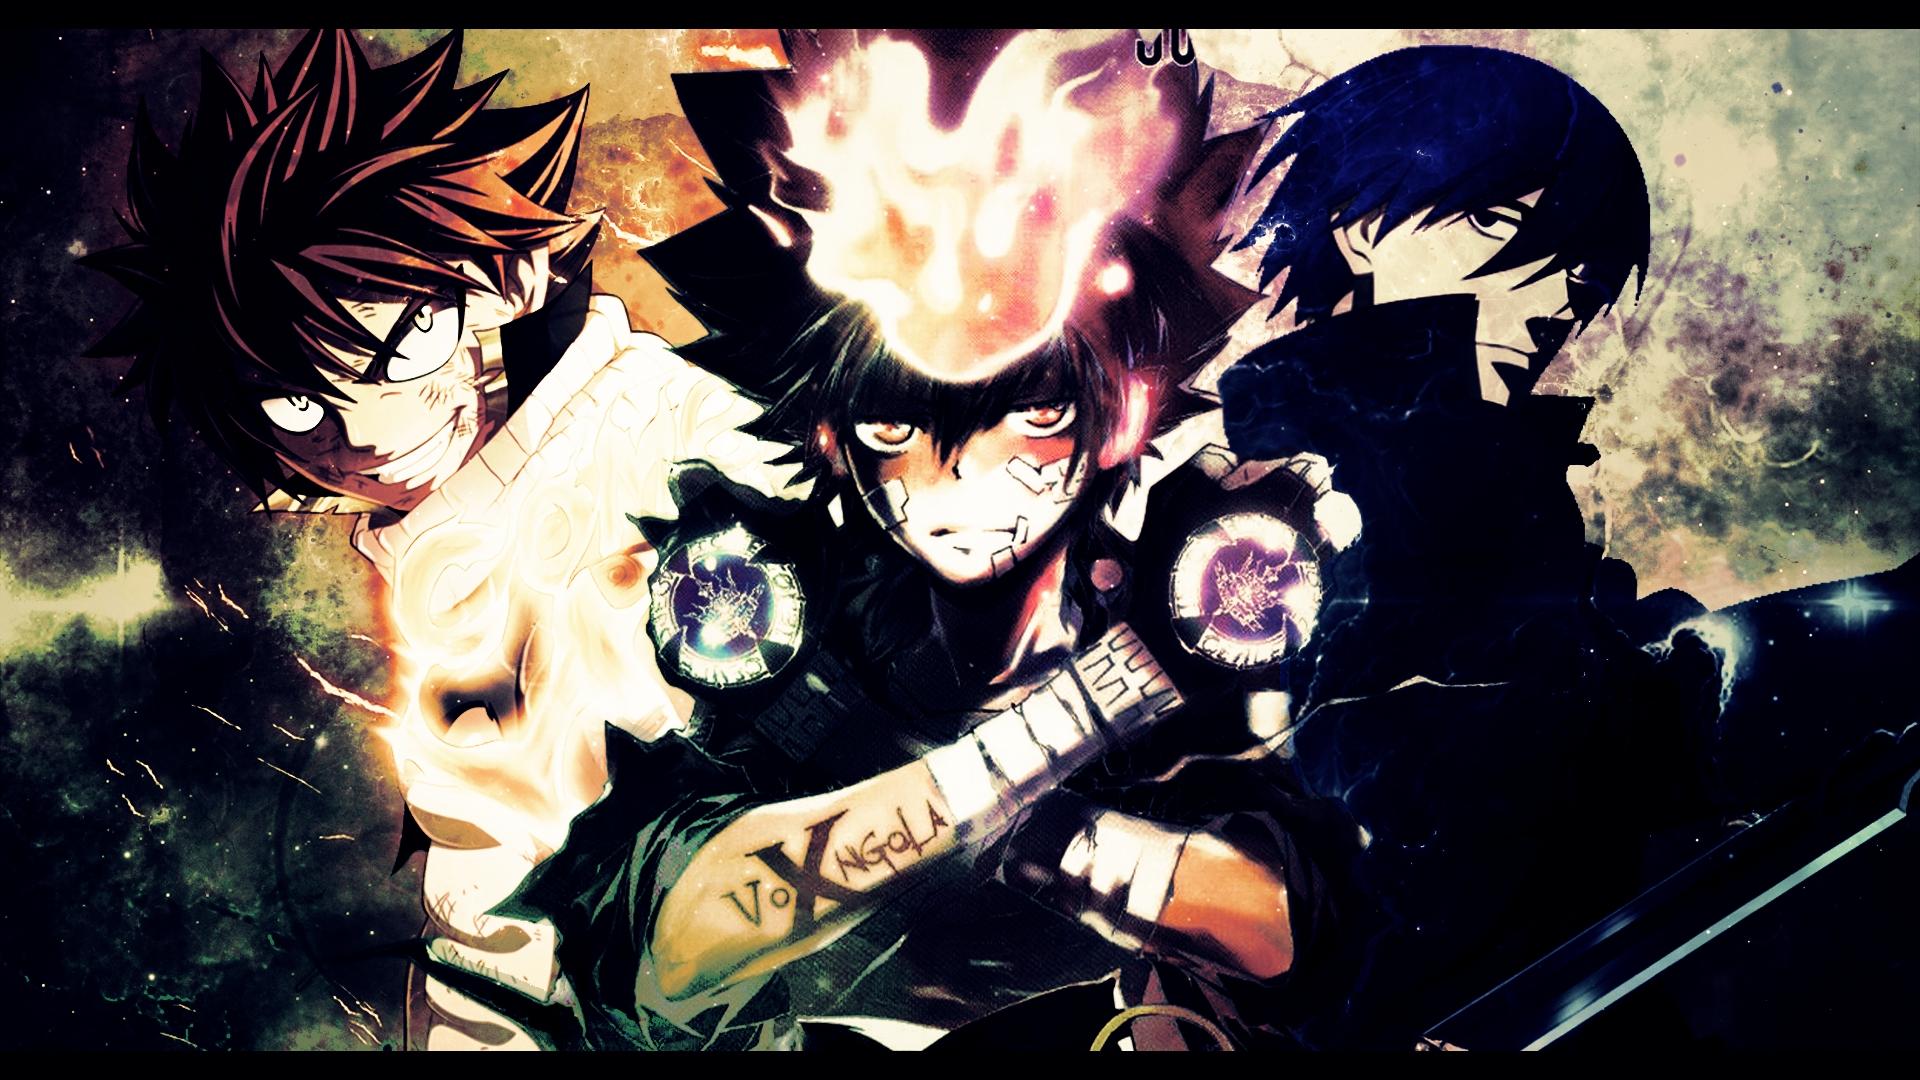 Anime wallpaper   1124590 1920x1080